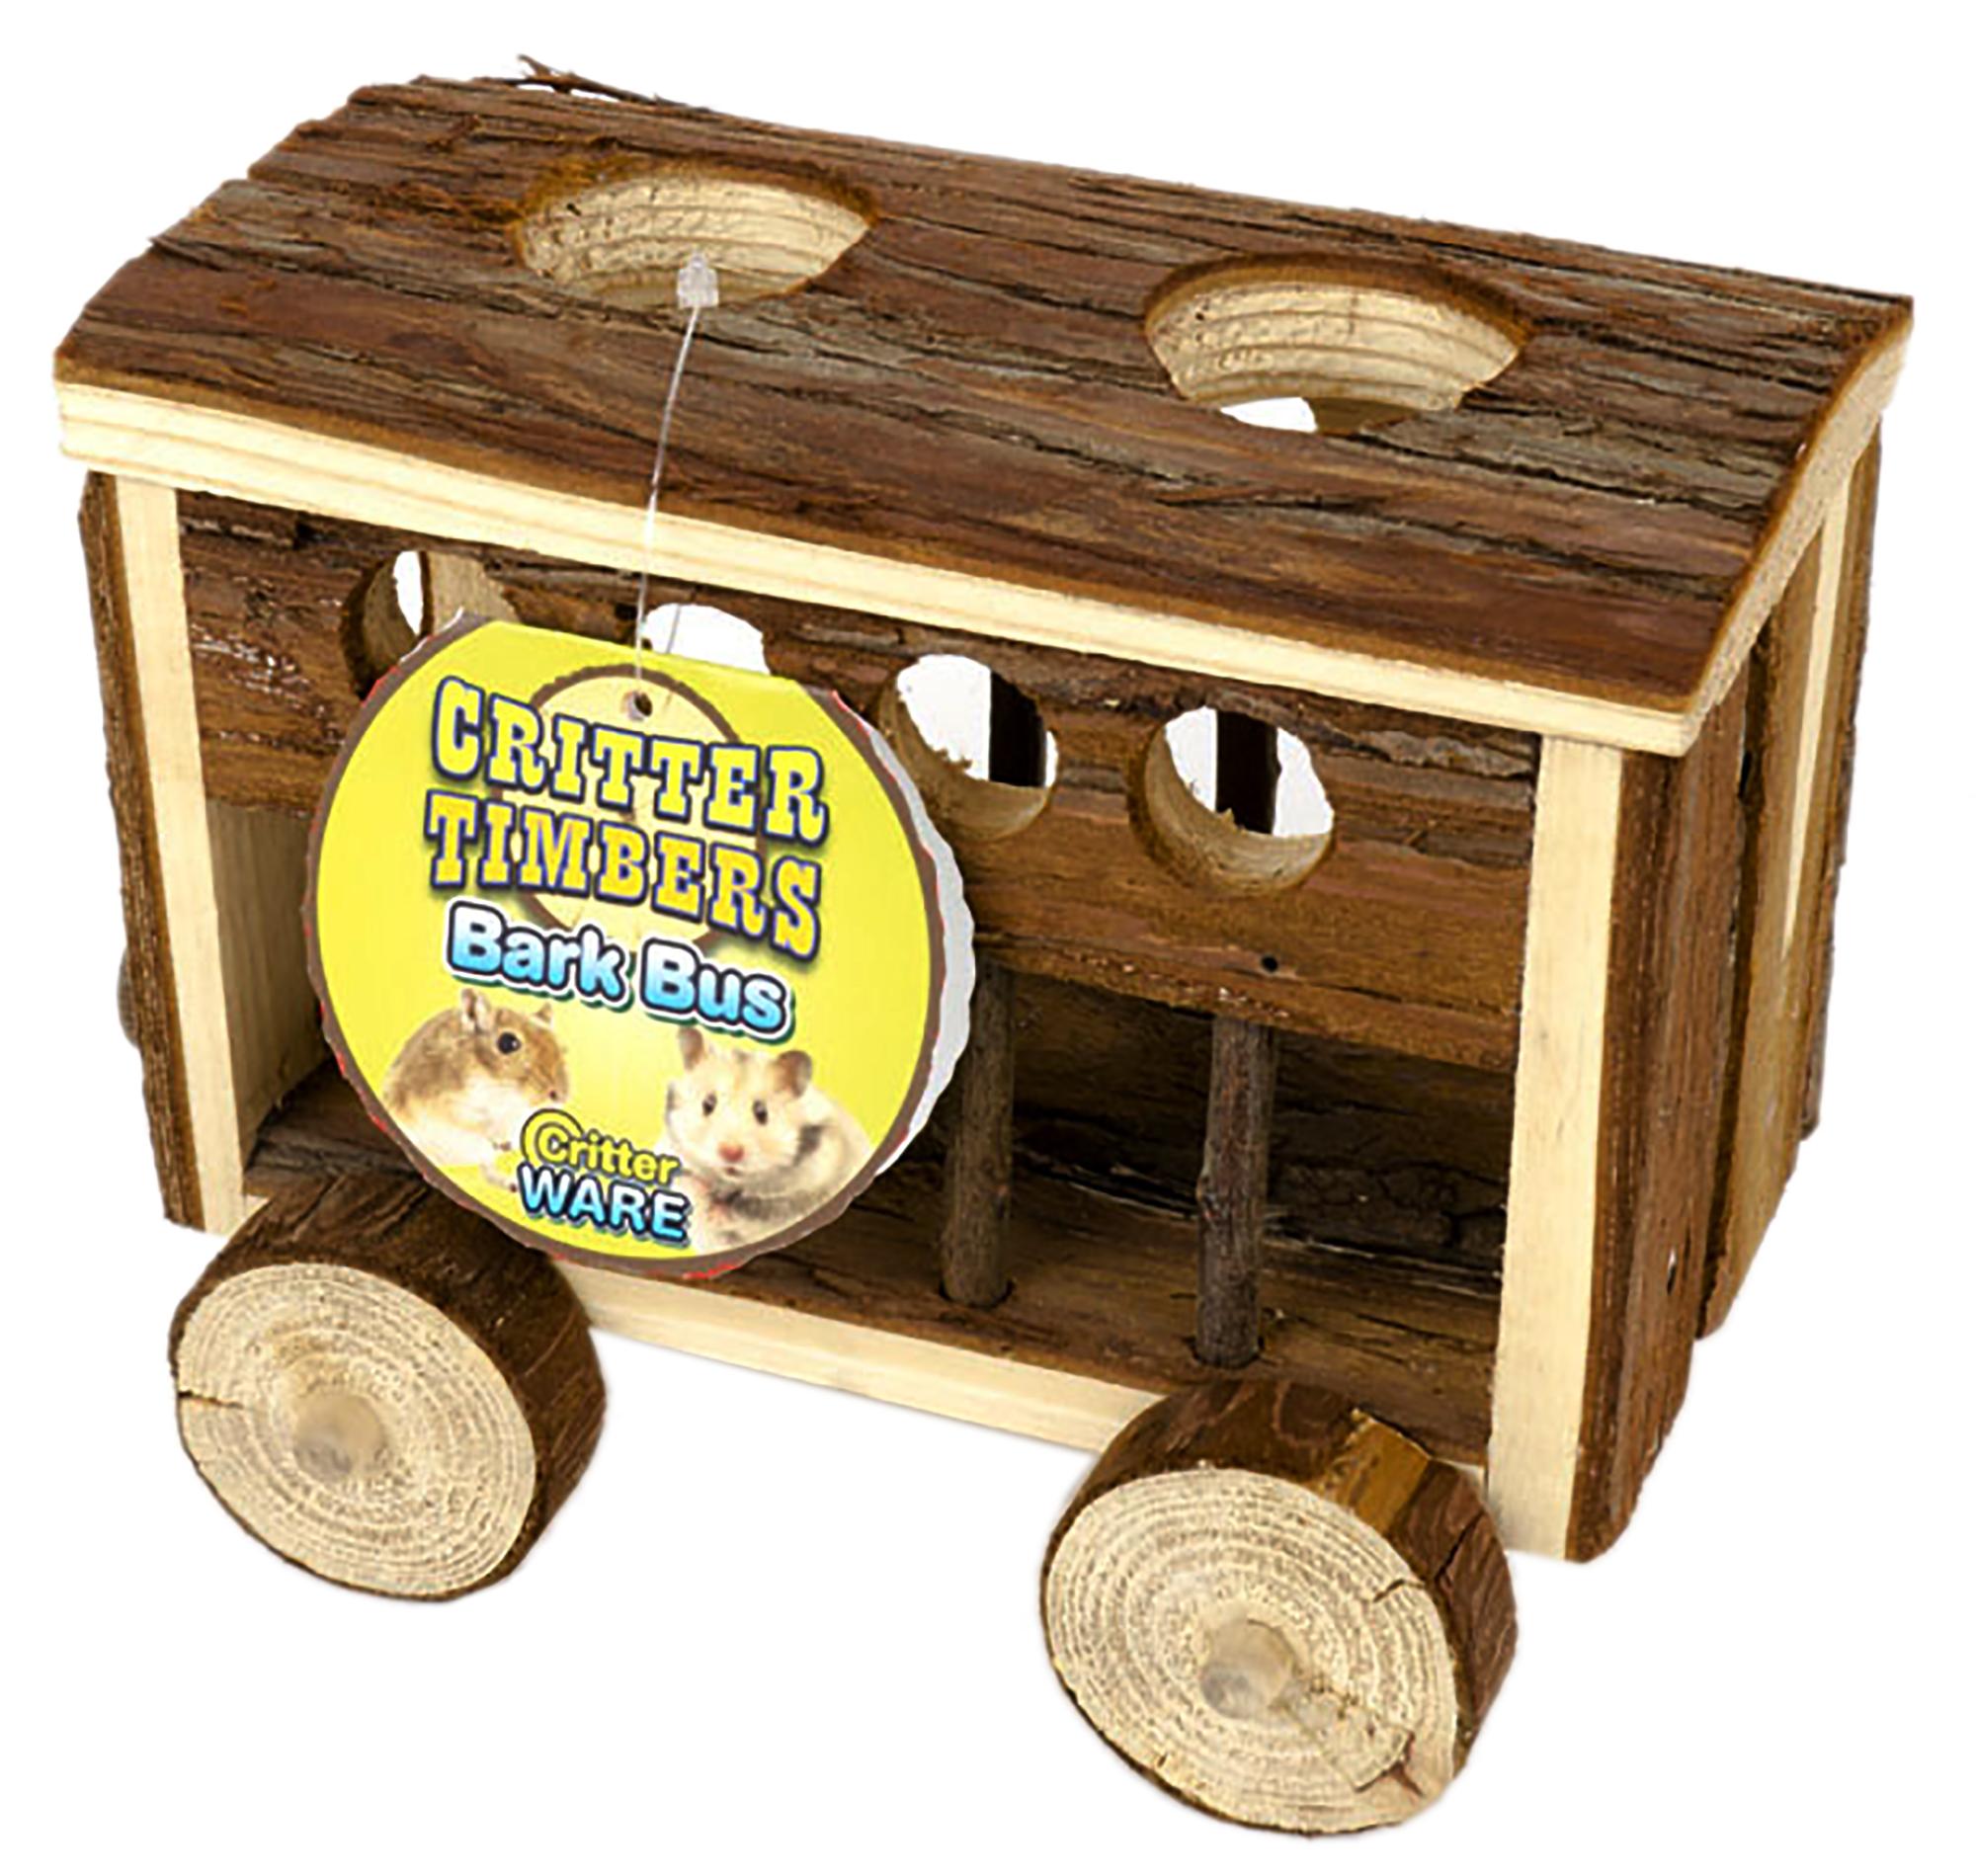 Critter Timber Bark Bus